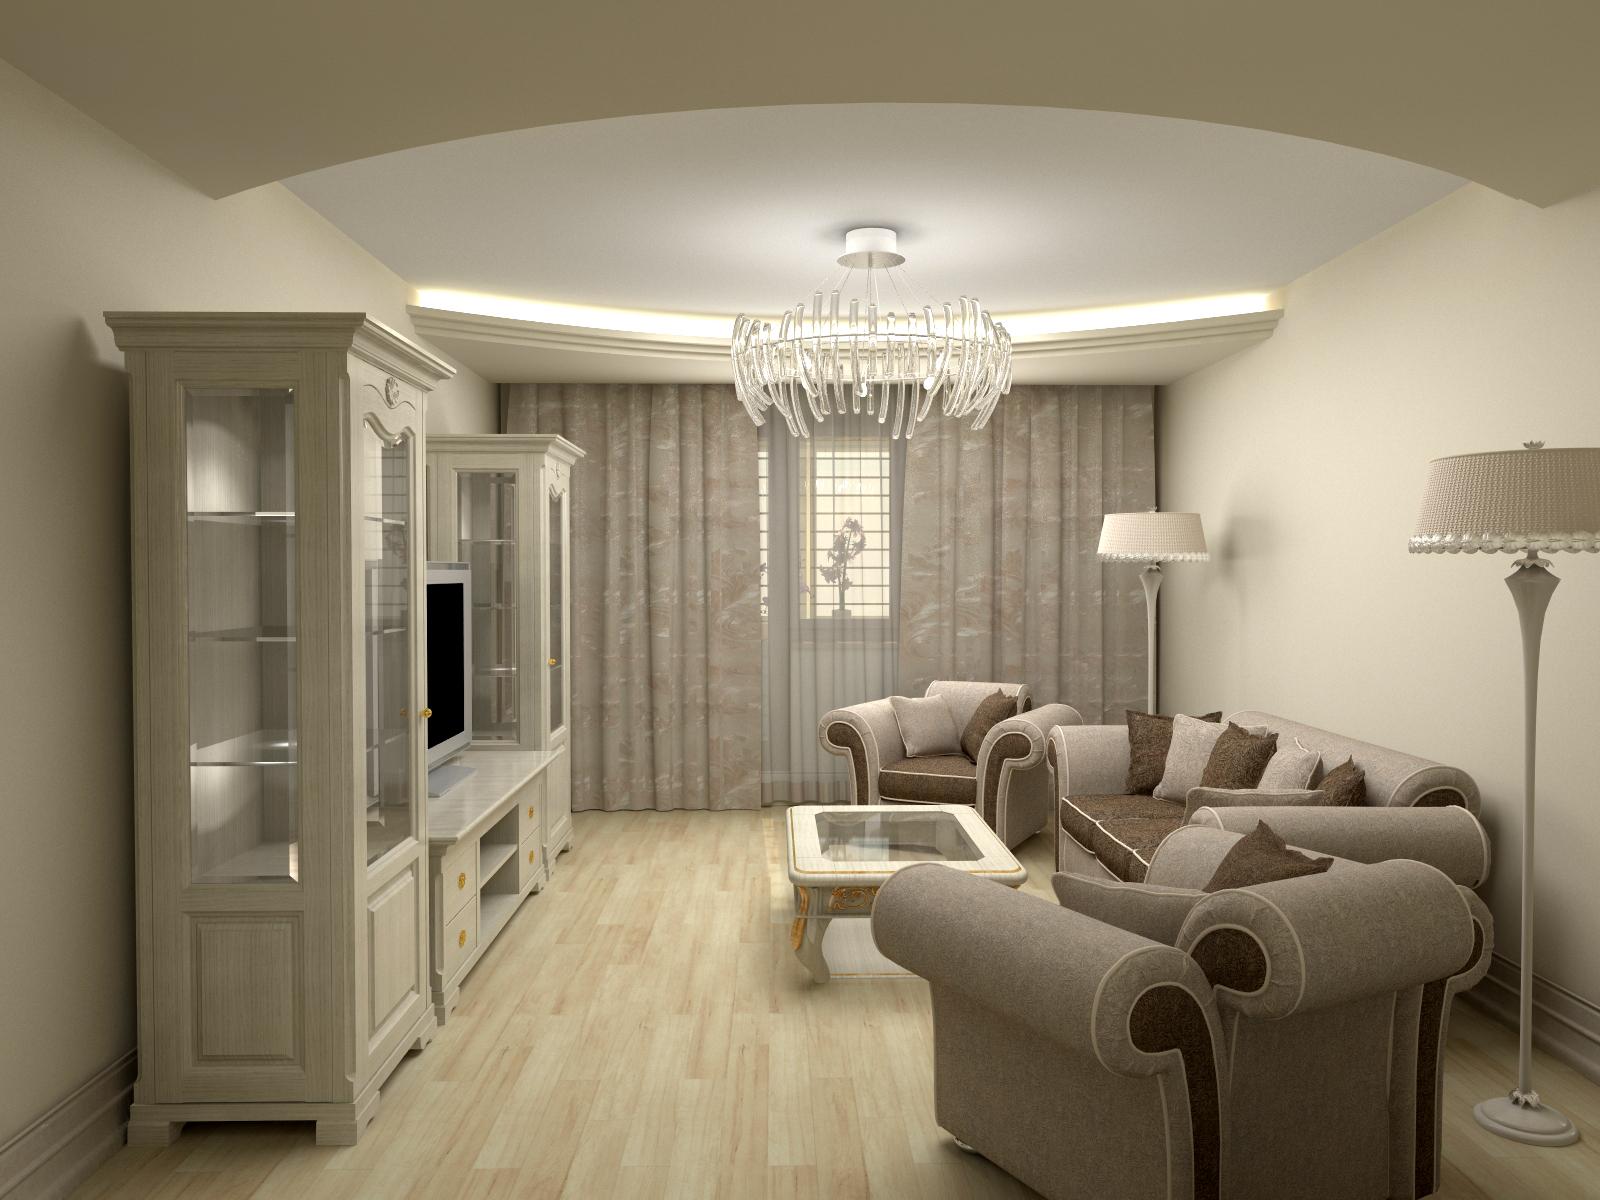 На Рублевке нашлась квартира за 3 млн рублей